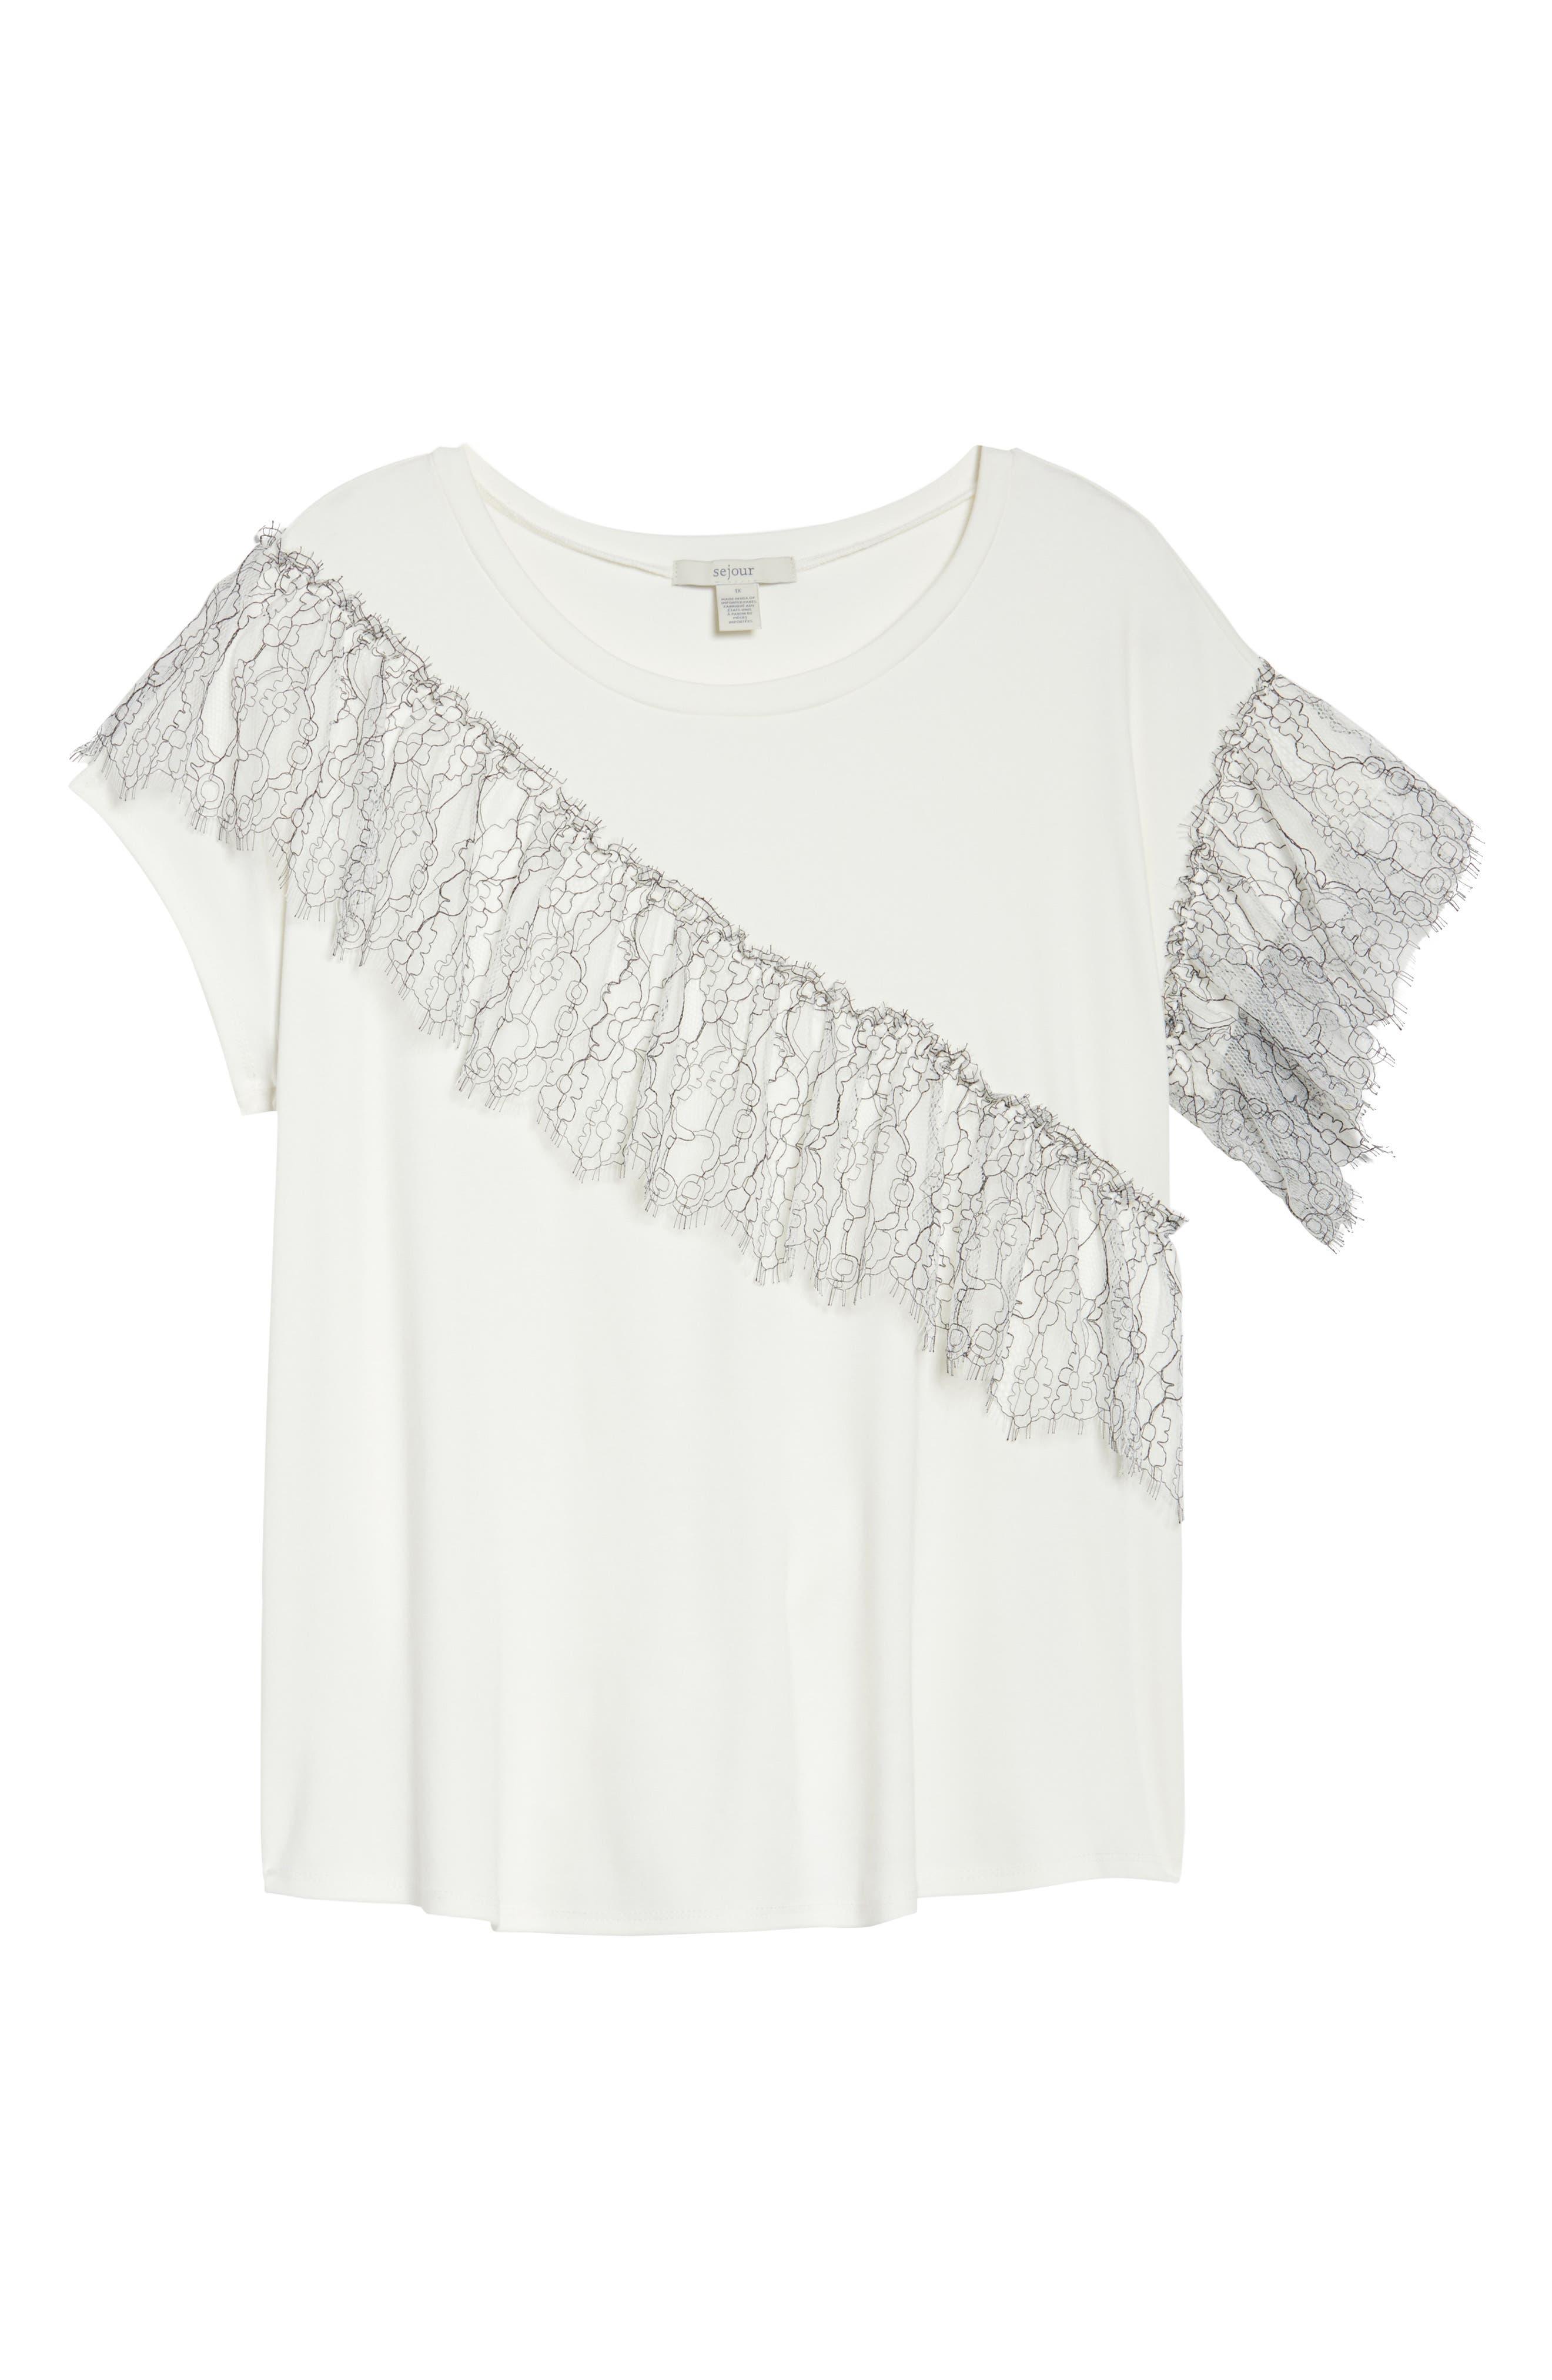 Asymmetrical Lace Tee,                             Alternate thumbnail 6, color,                             White- Black